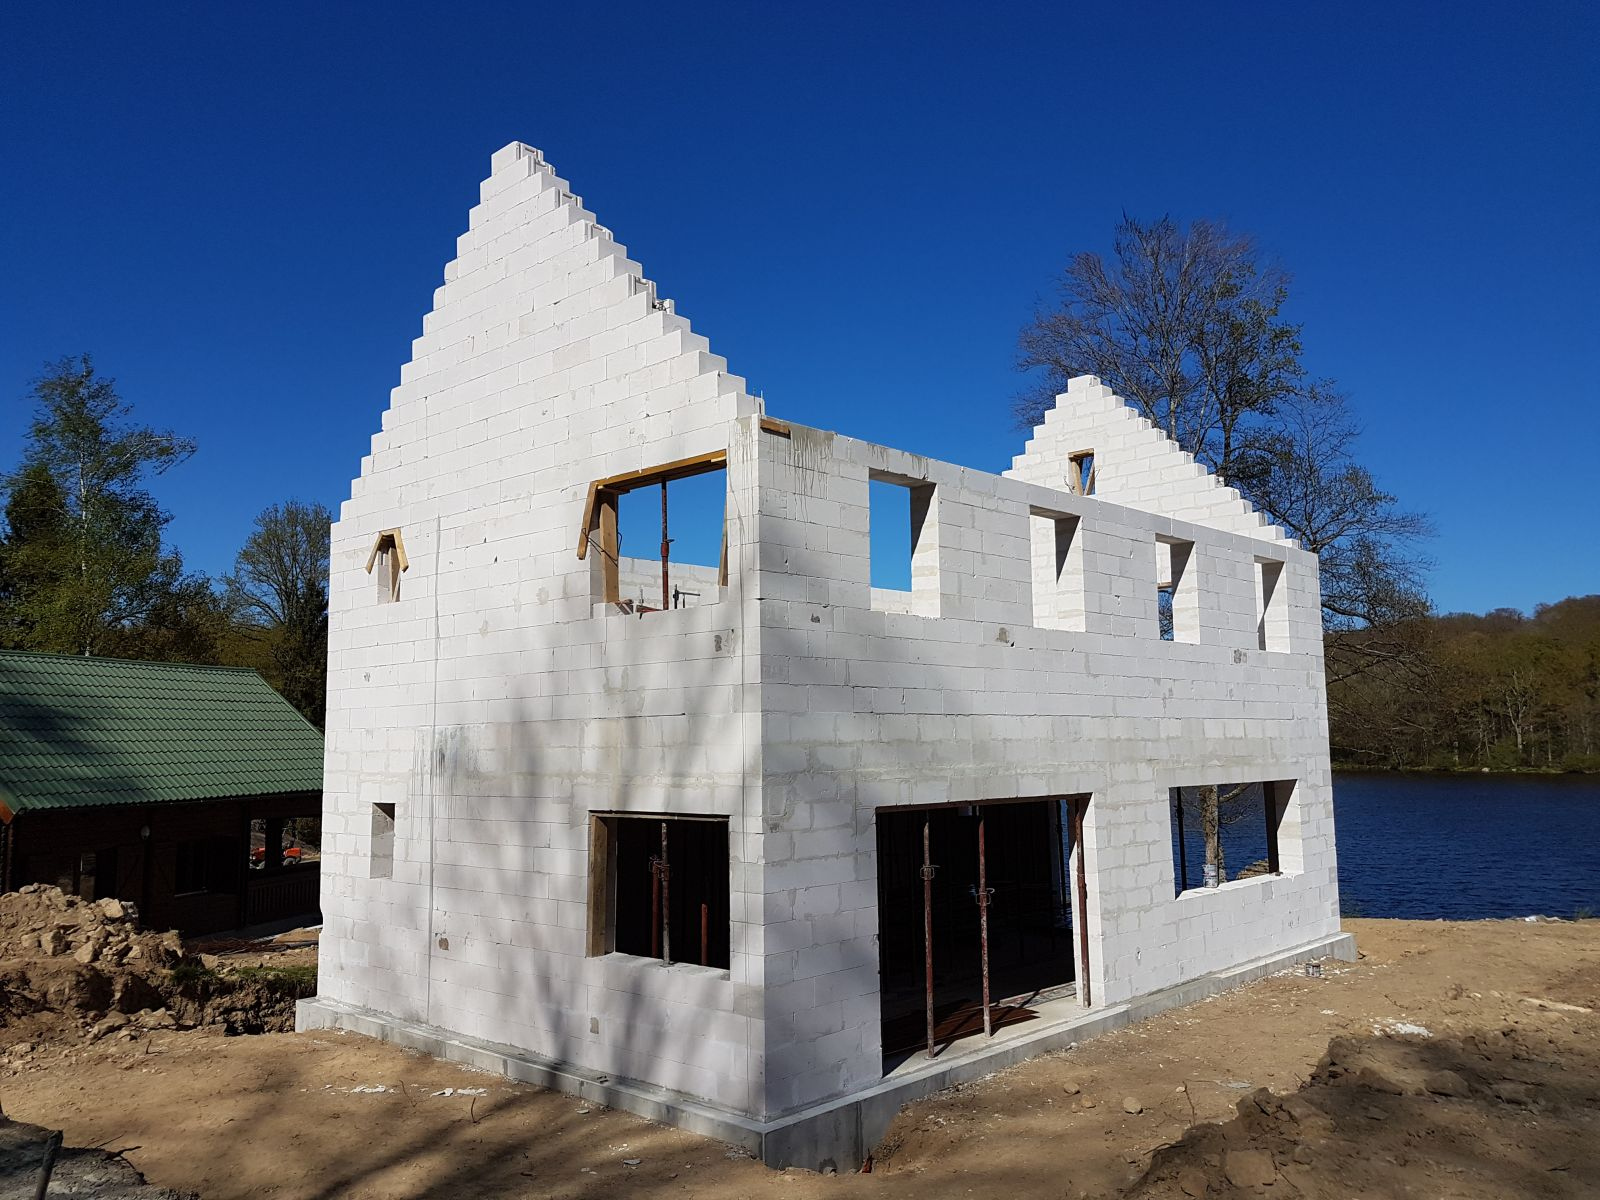 maison kit beton cellulaire avie home. Black Bedroom Furniture Sets. Home Design Ideas